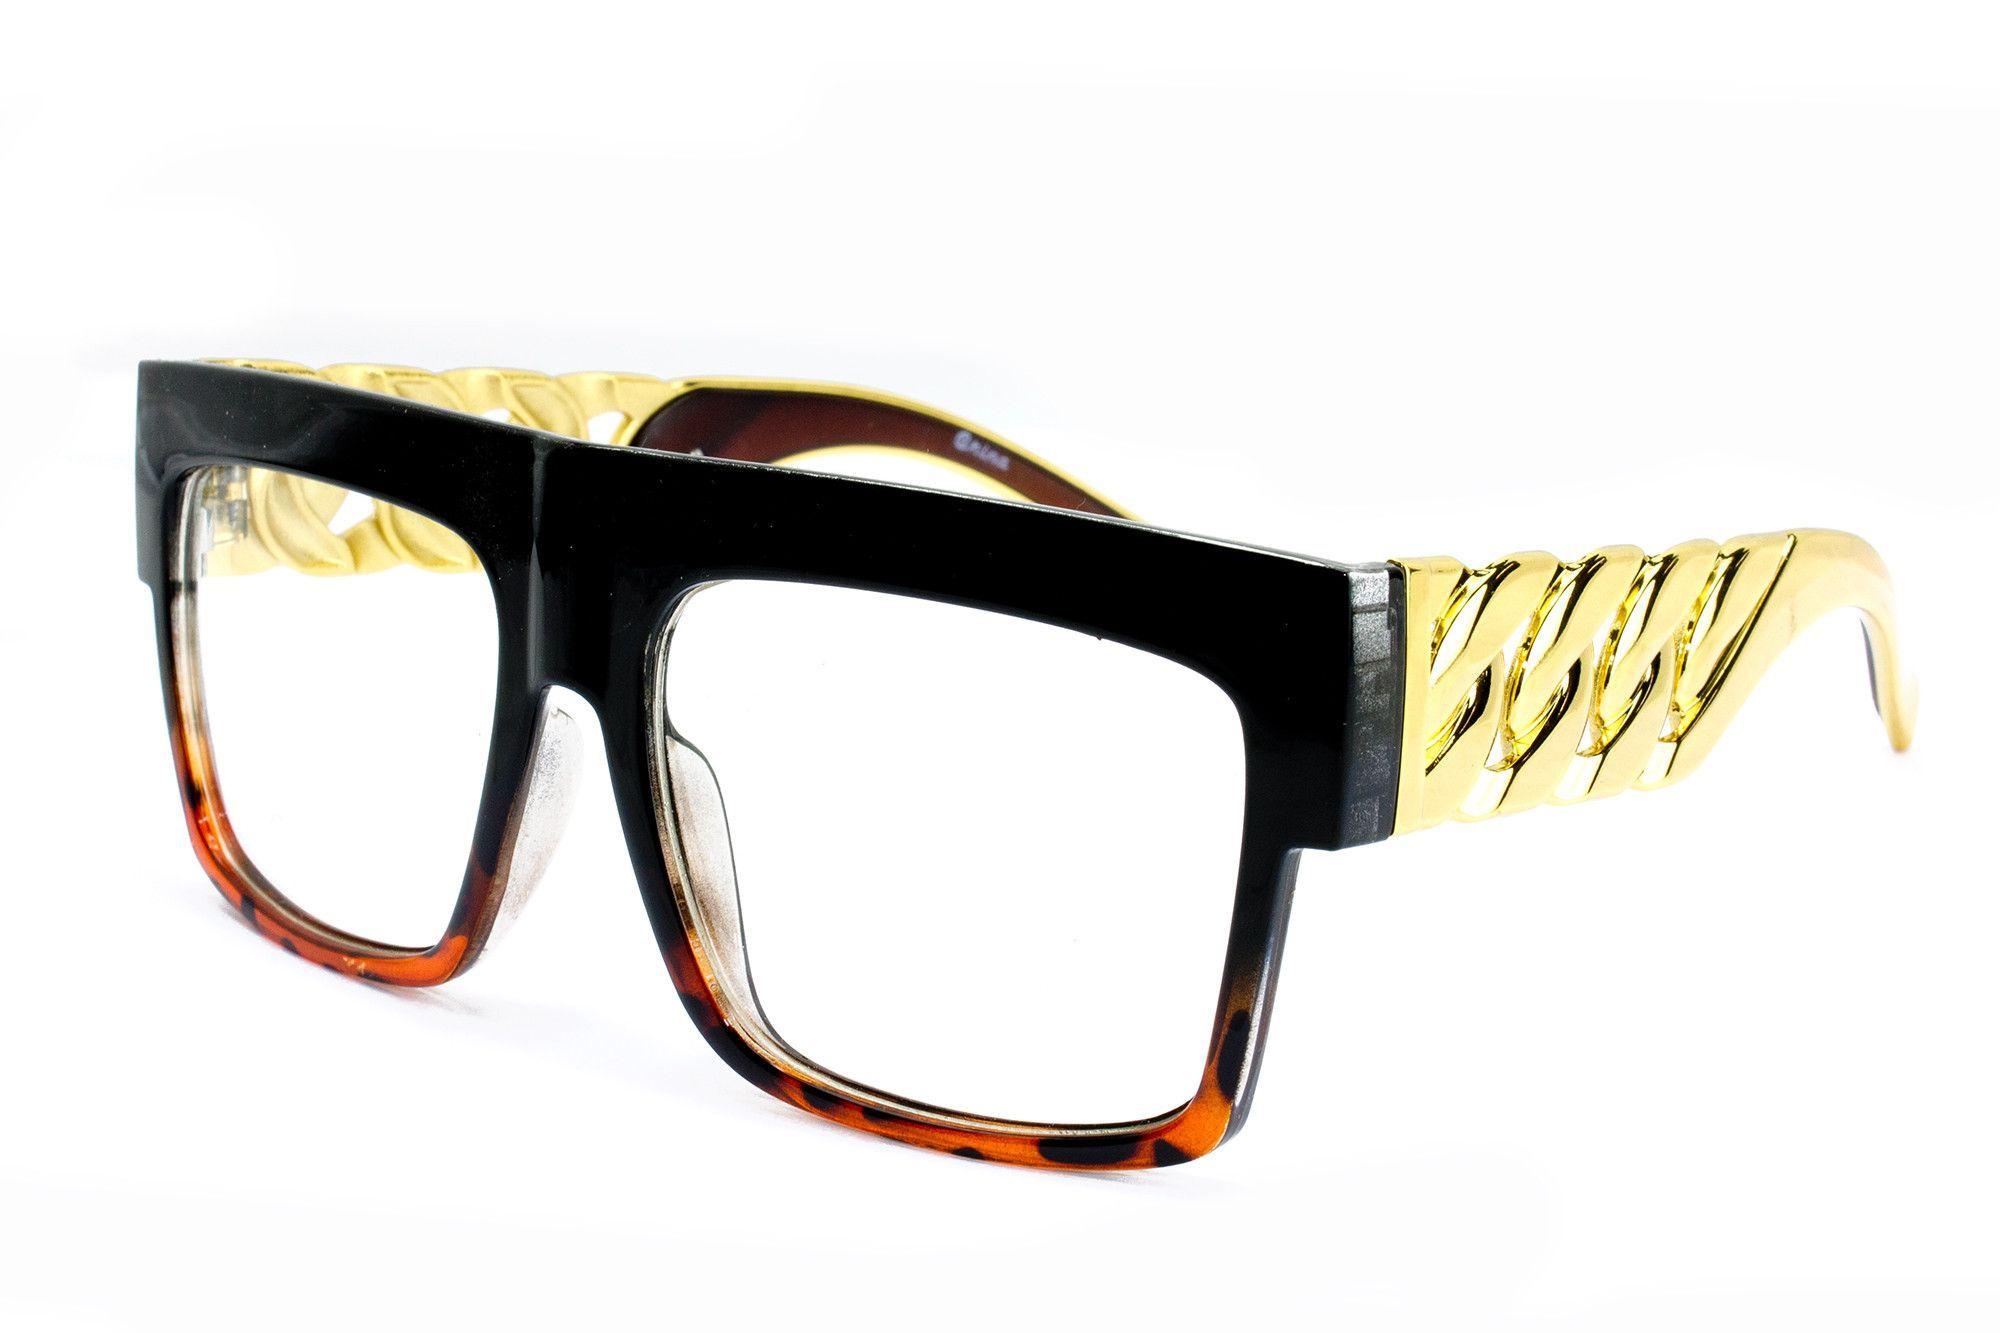 464b4feb7b99 Thick Frame Rapper 80 s 90 s Retro Hip Hop DJ Large Design Squared Clear  Lens Glasses